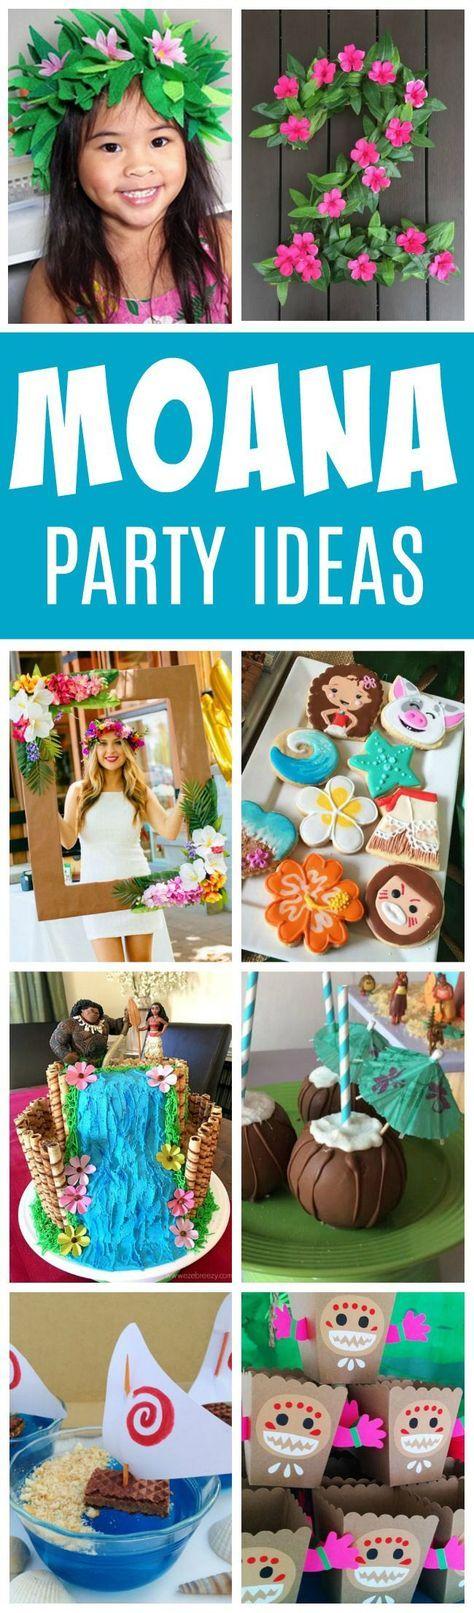 27 Disney Moana Birthday Party Ideas   Pretty My Party